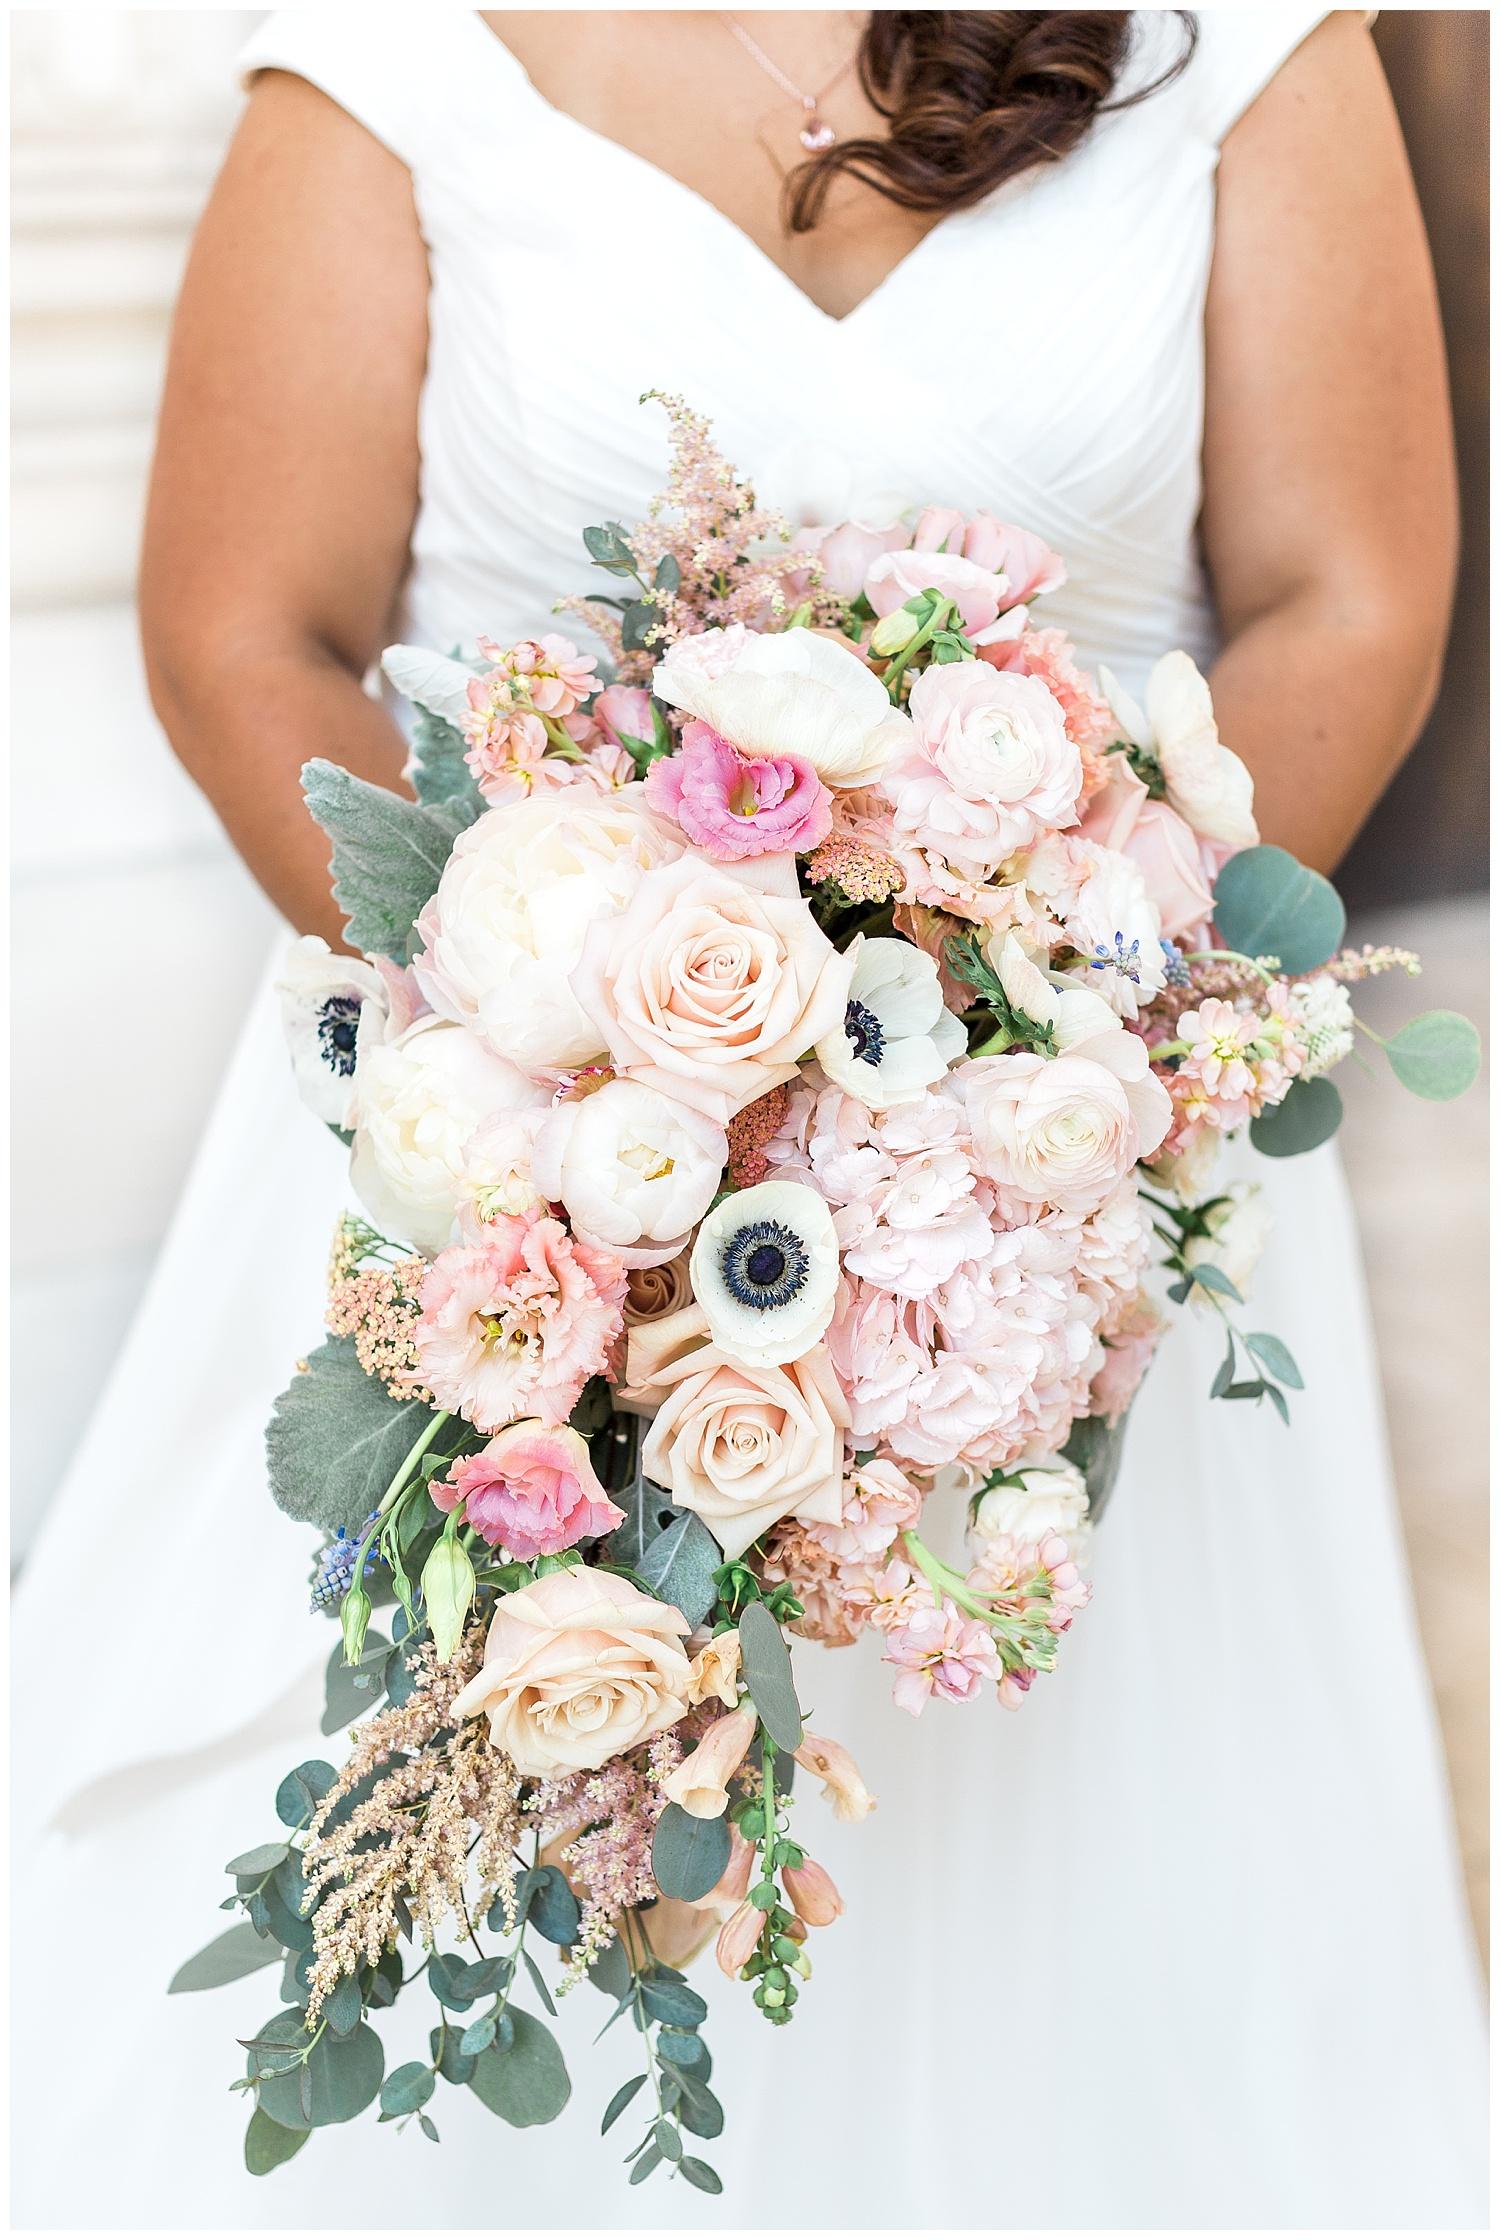 romantic-chicago-wedding-photographer-bucktown-elgin (18 of 62).jpg